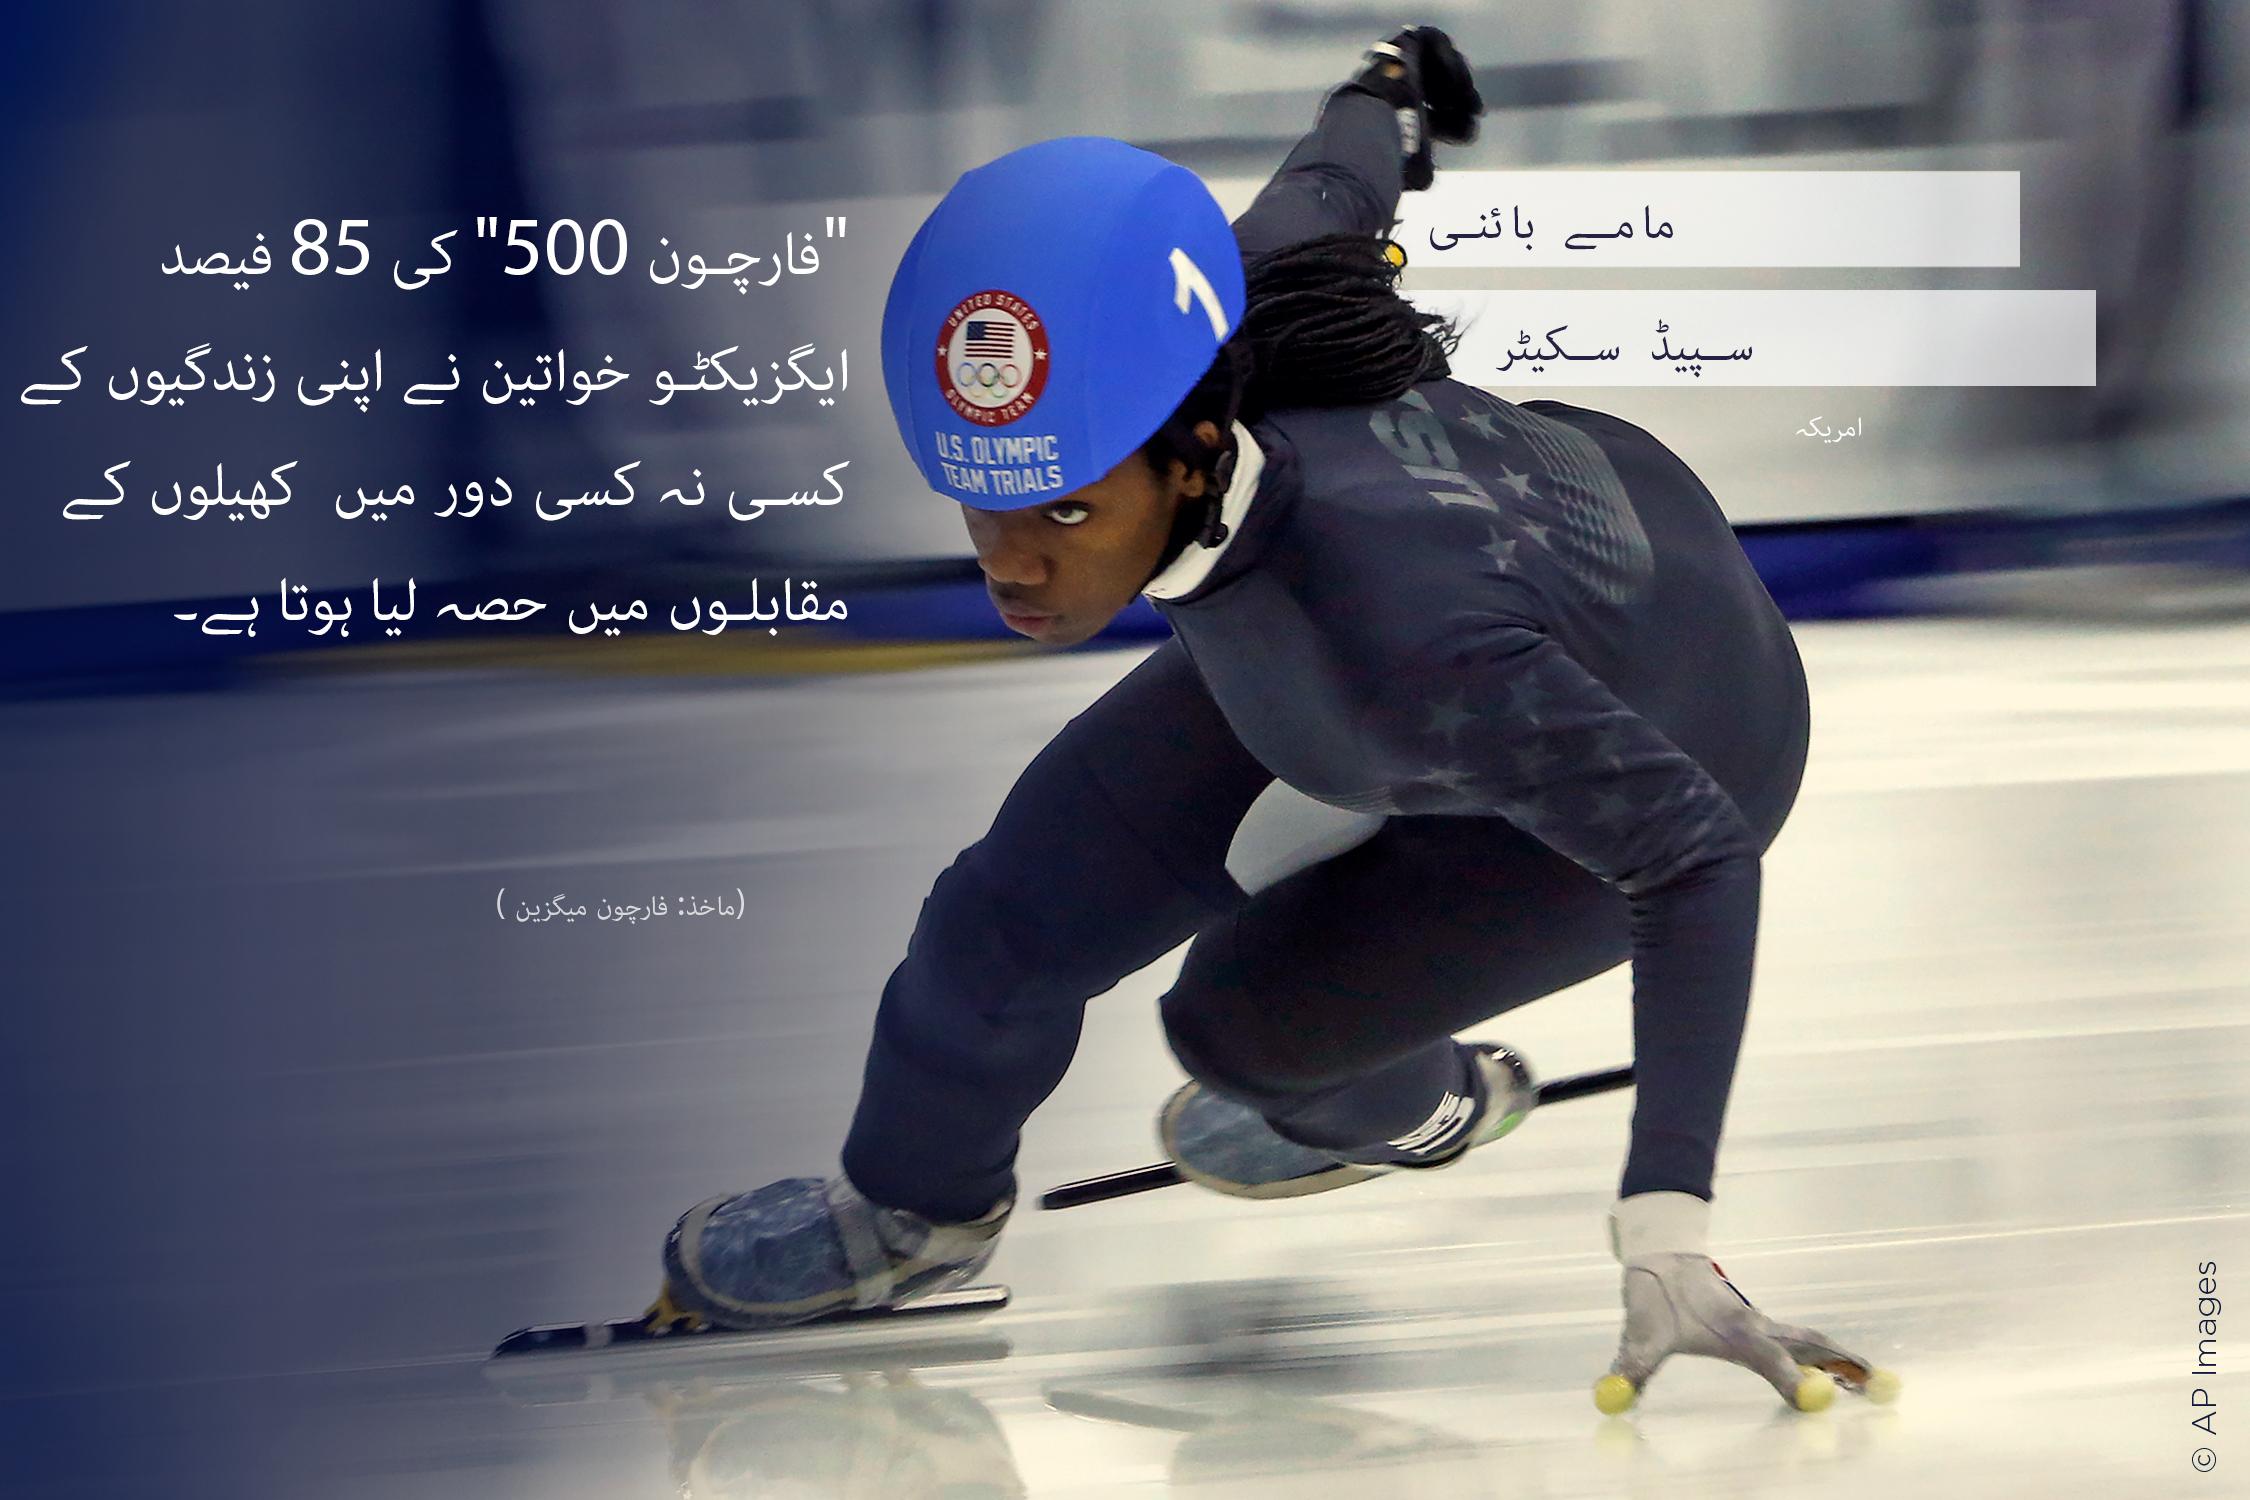 Speedskater skating, with words overlaid (© AP Images)